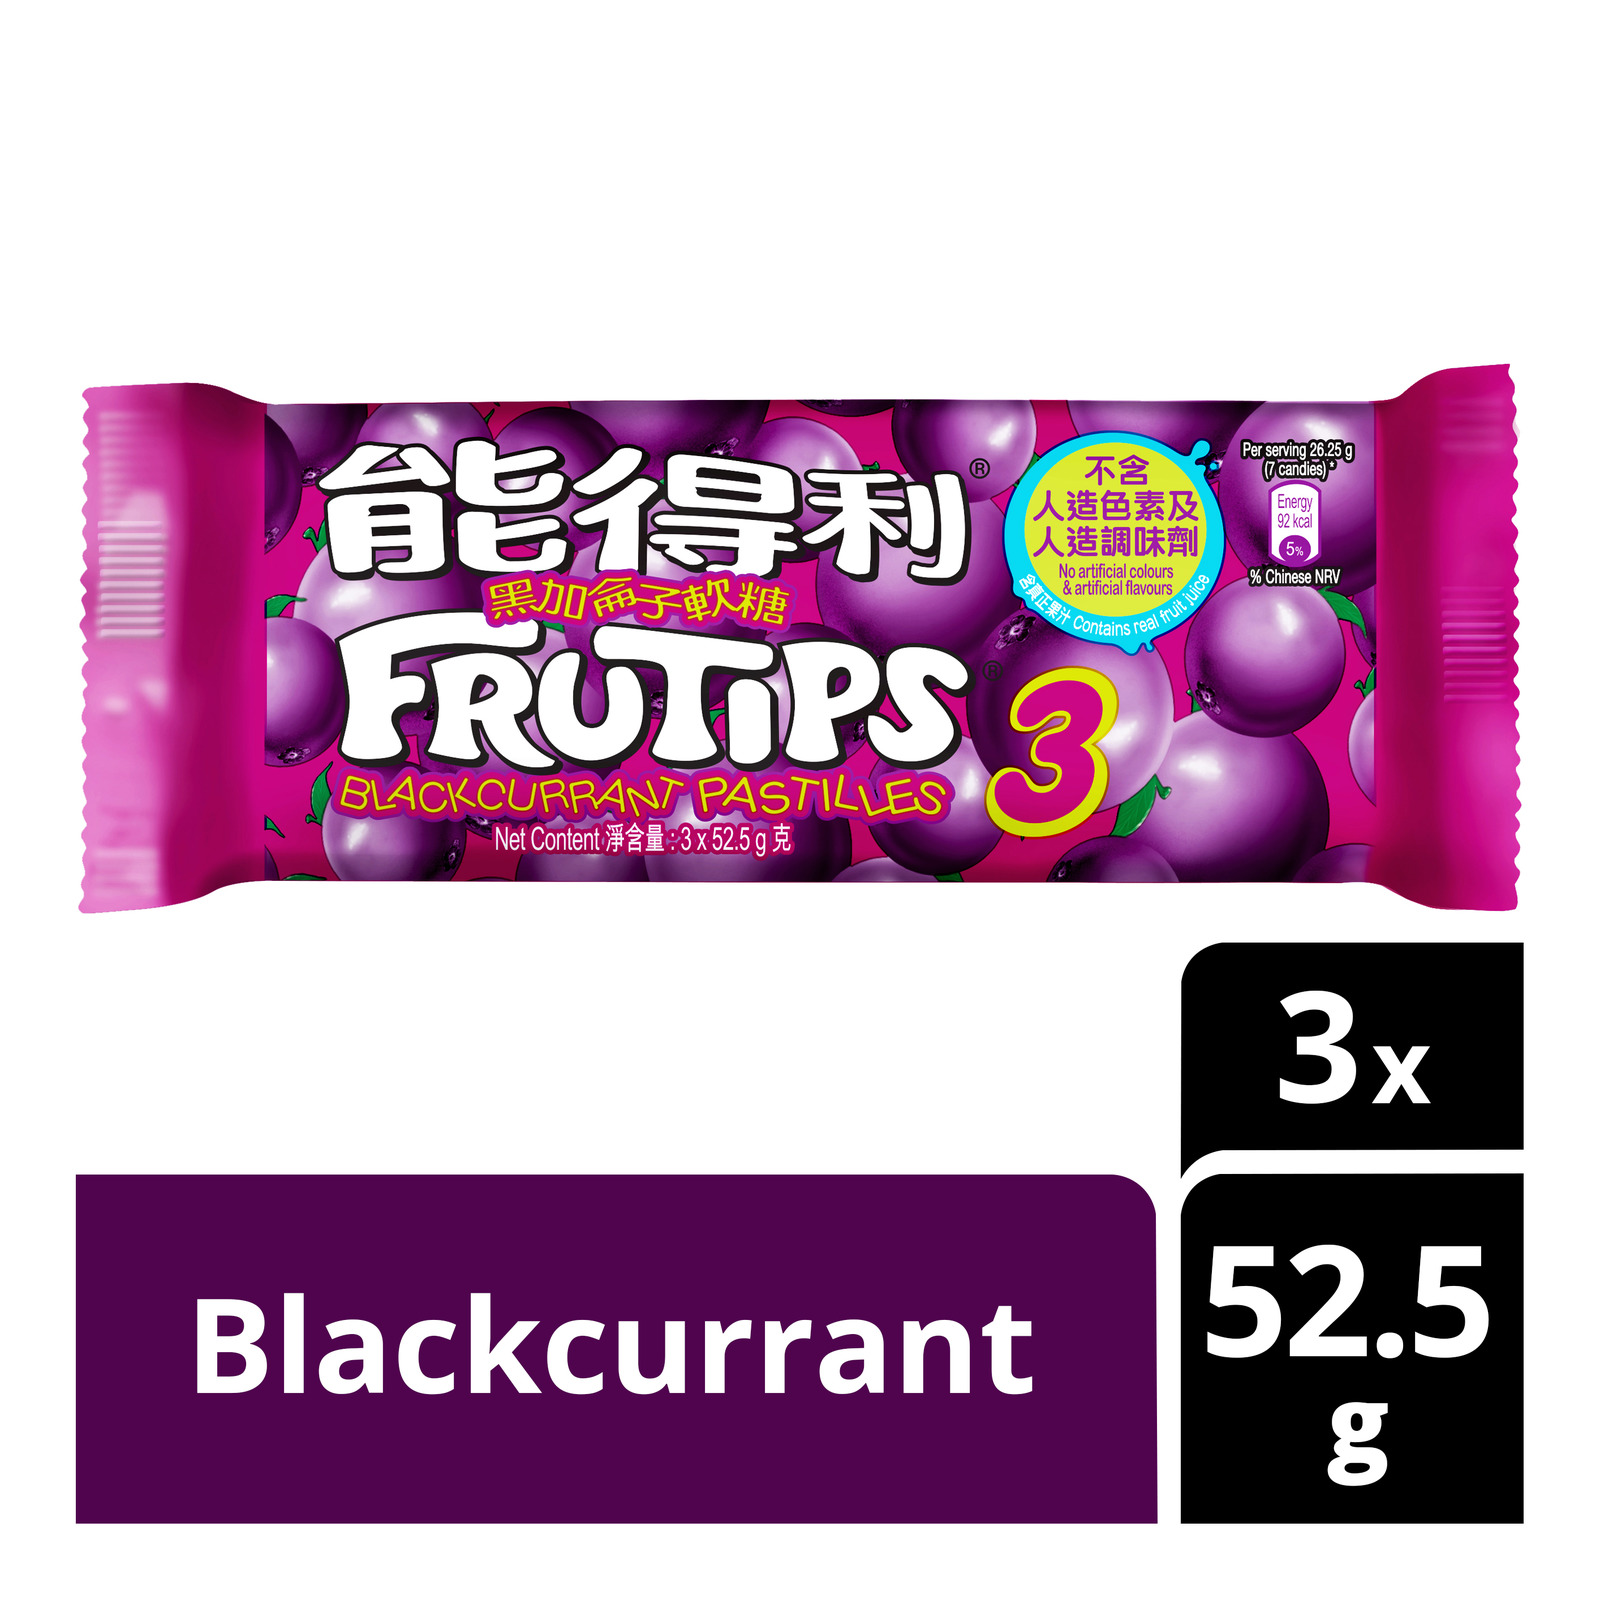 Frutips Pastilles - Blackcurrant